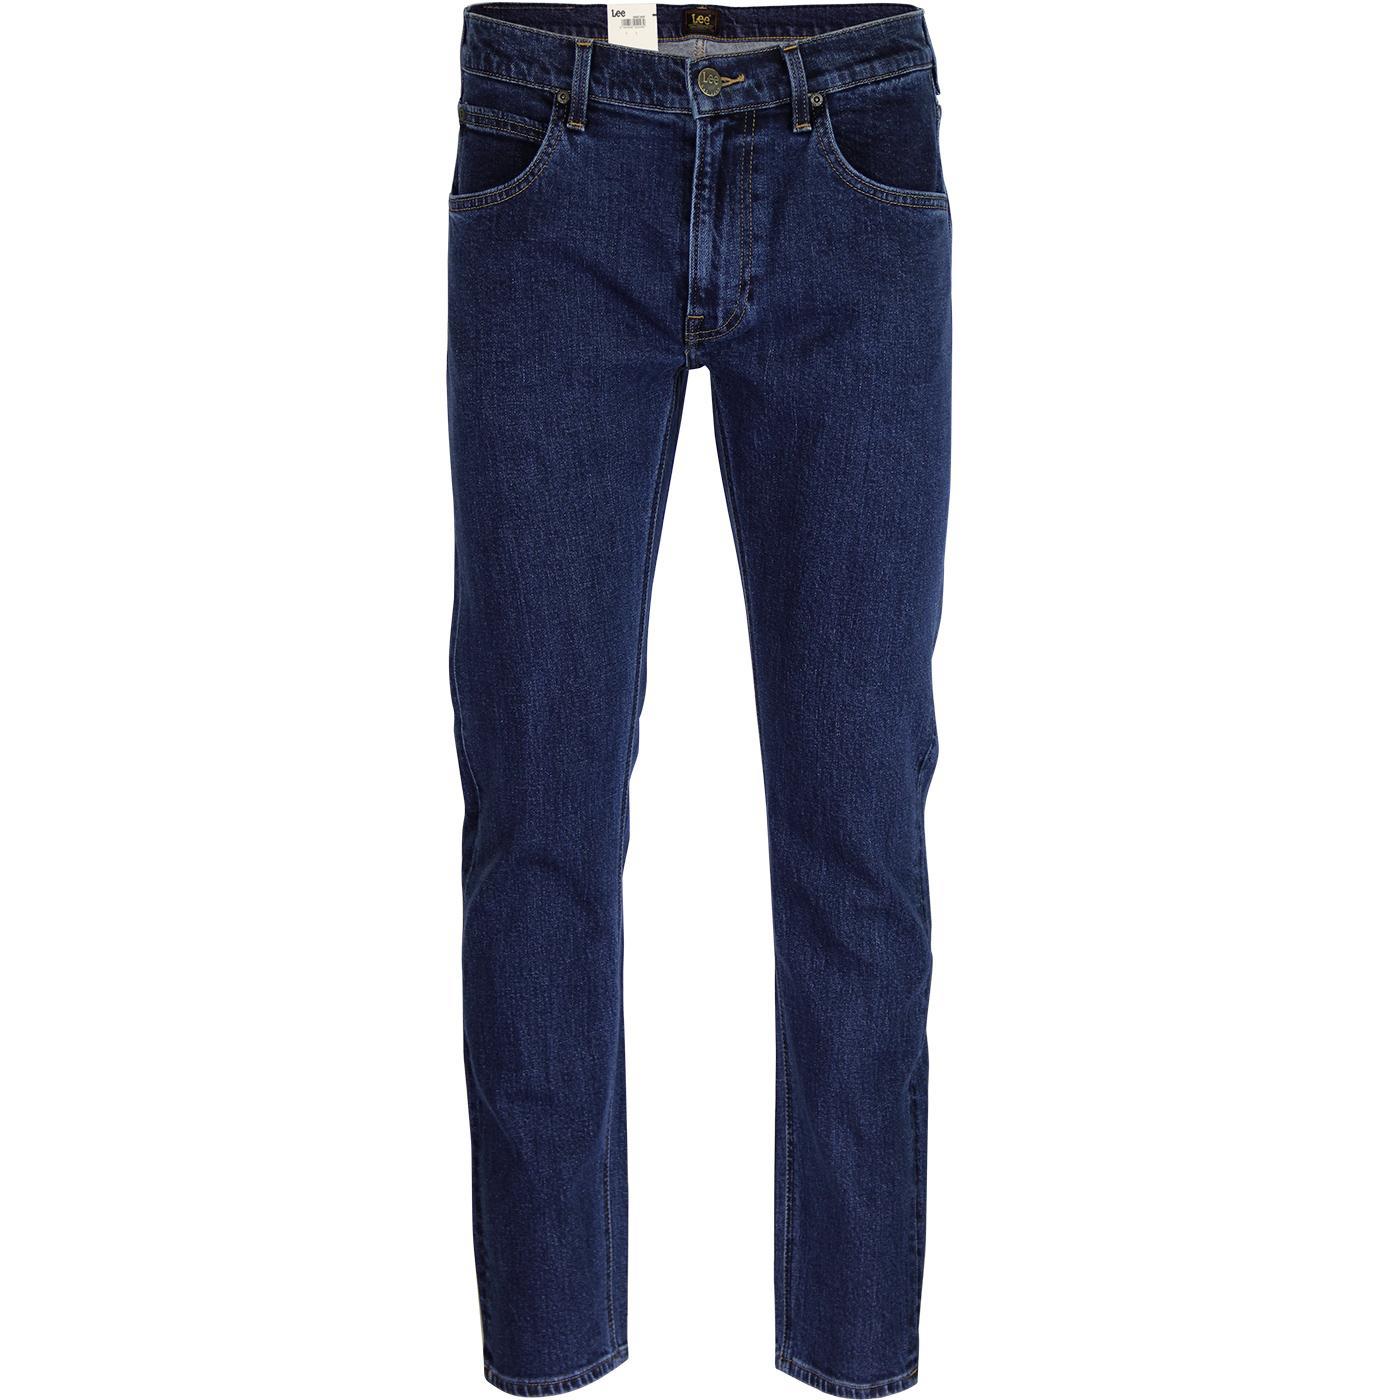 Daren LEE Regular Slim Mod Denim Jeans DARK STONE